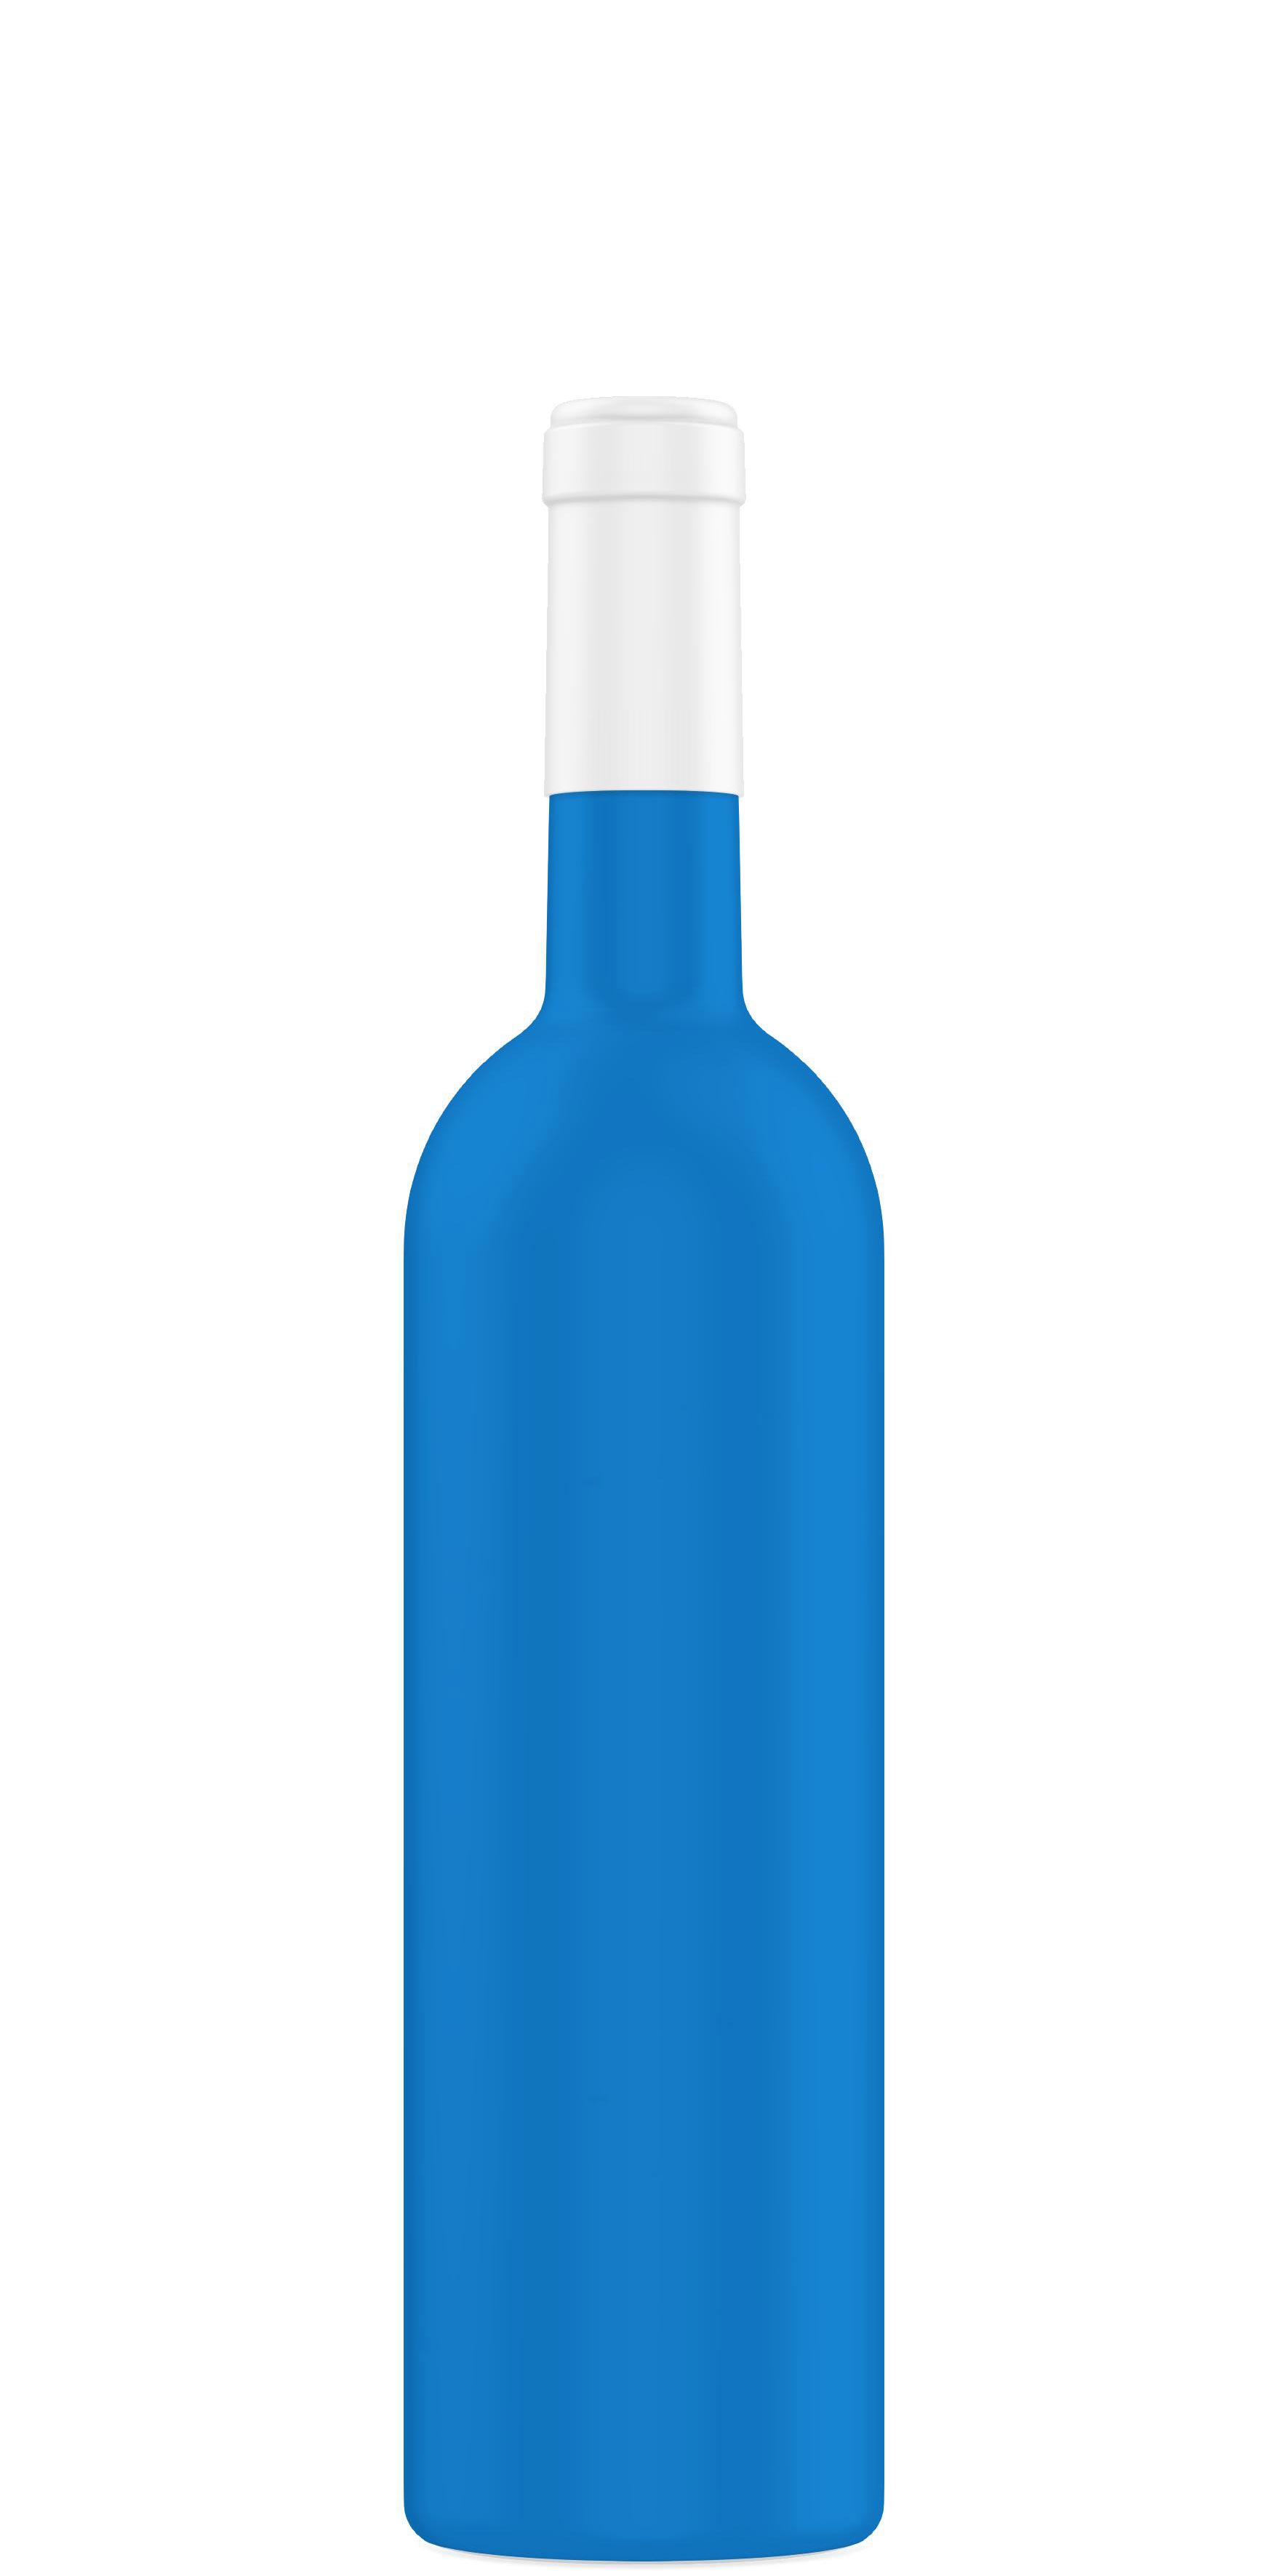 Packaging shape of still wines 75cl